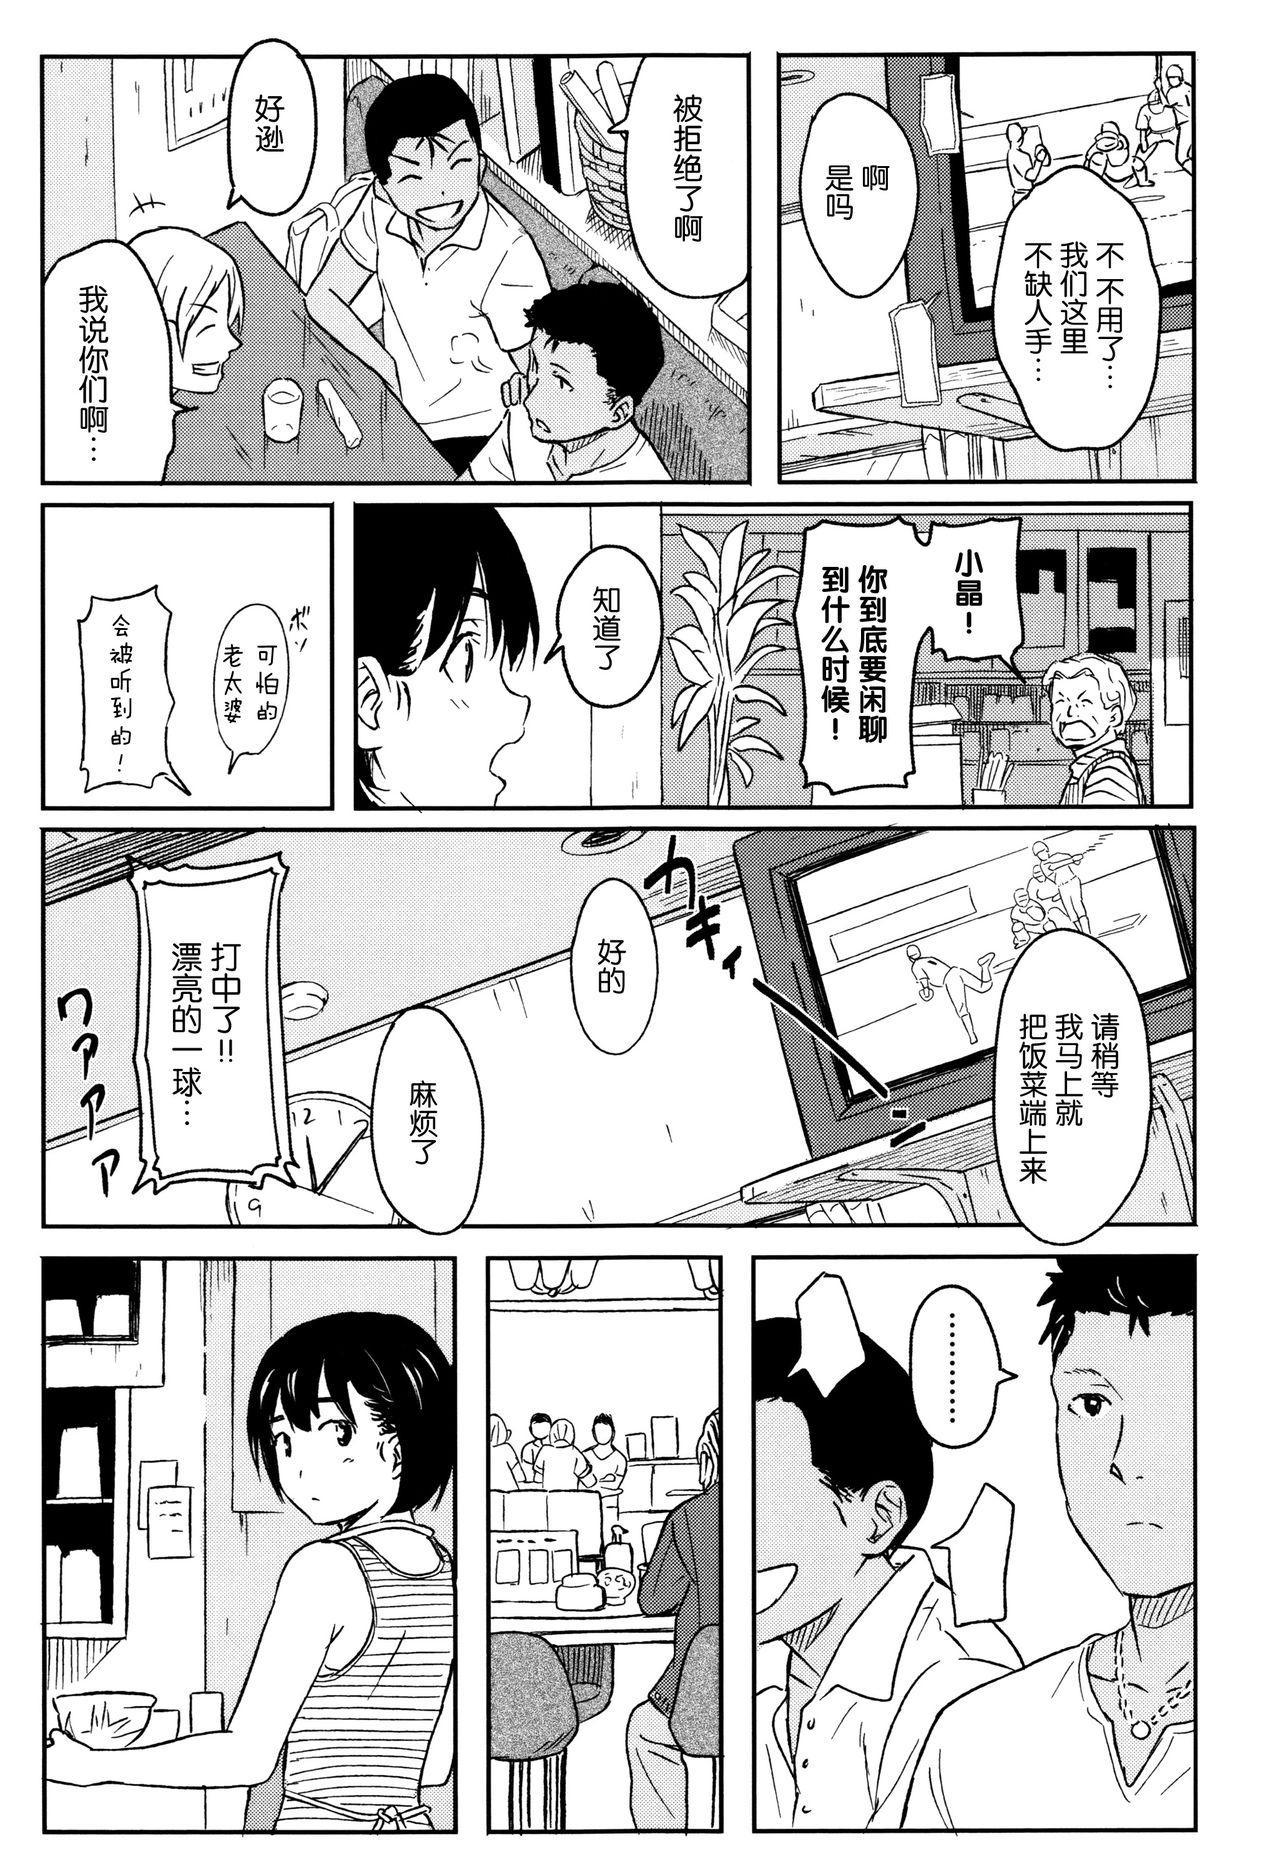 Tokubetsu na Mainichi - Special daily 177